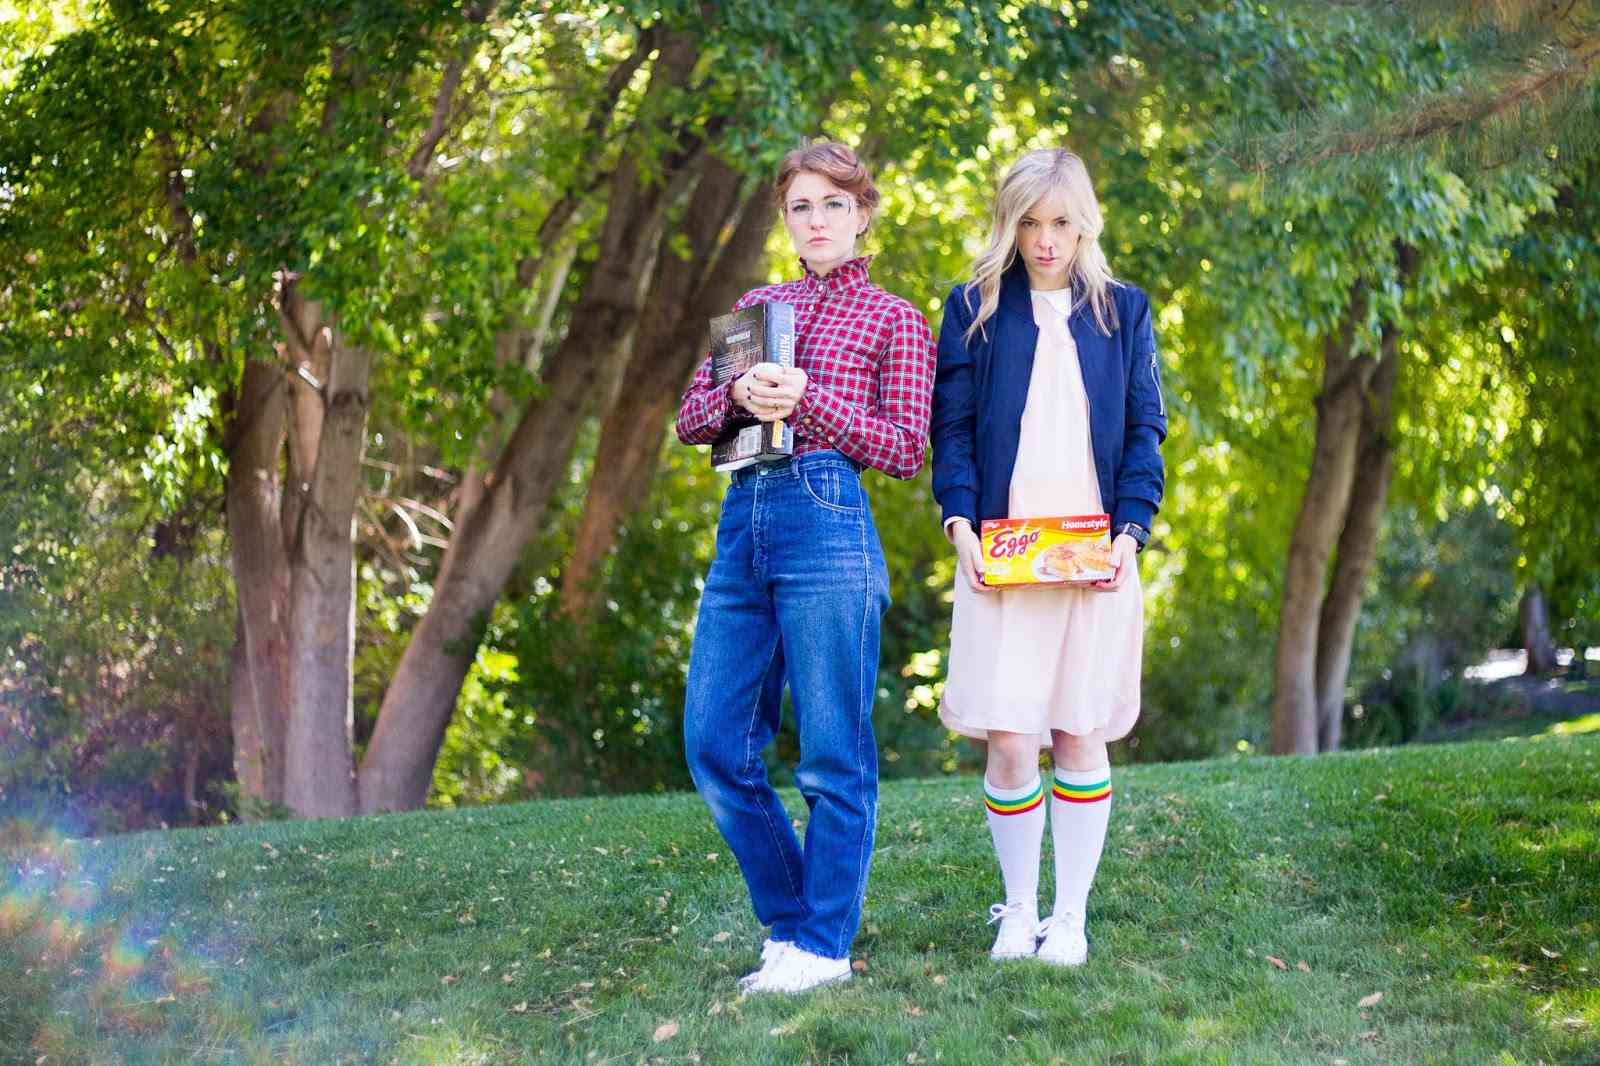 'Stranger Things' Halloween costumes